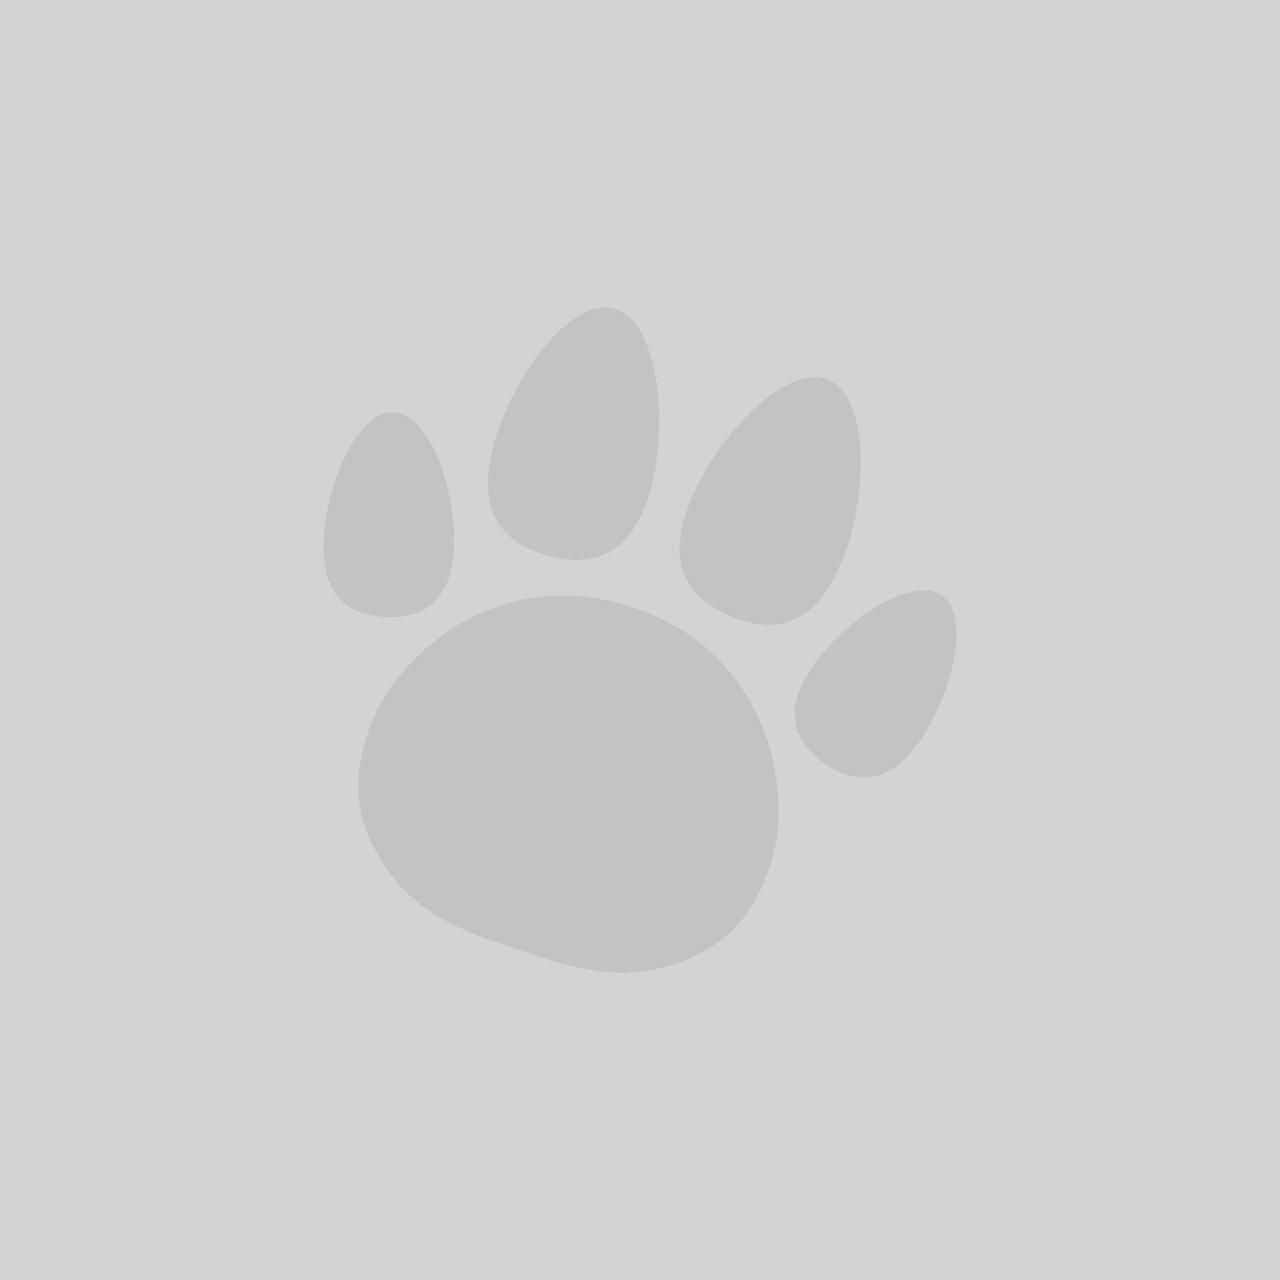 Rufus & Rosie Black & White Ceramic Meow Cat Bowl